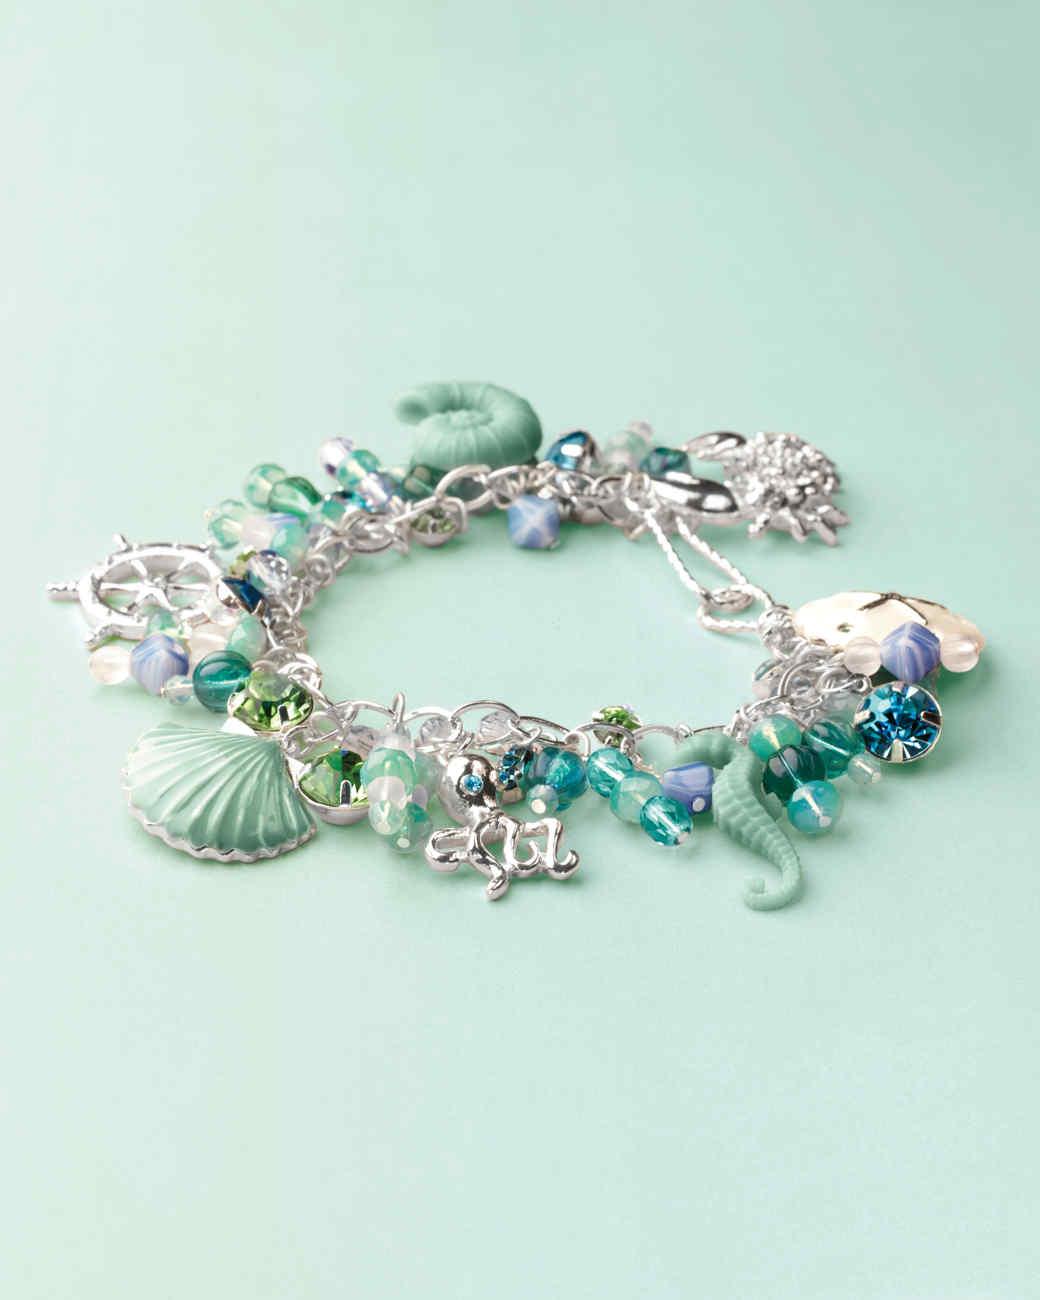 mscrafts-jewelry3-513.jpg